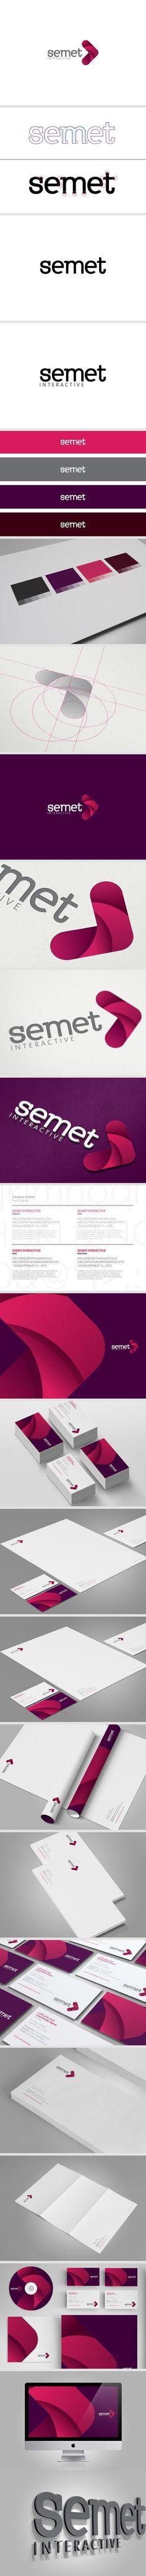 Semet - designed by Mohd Almousa.